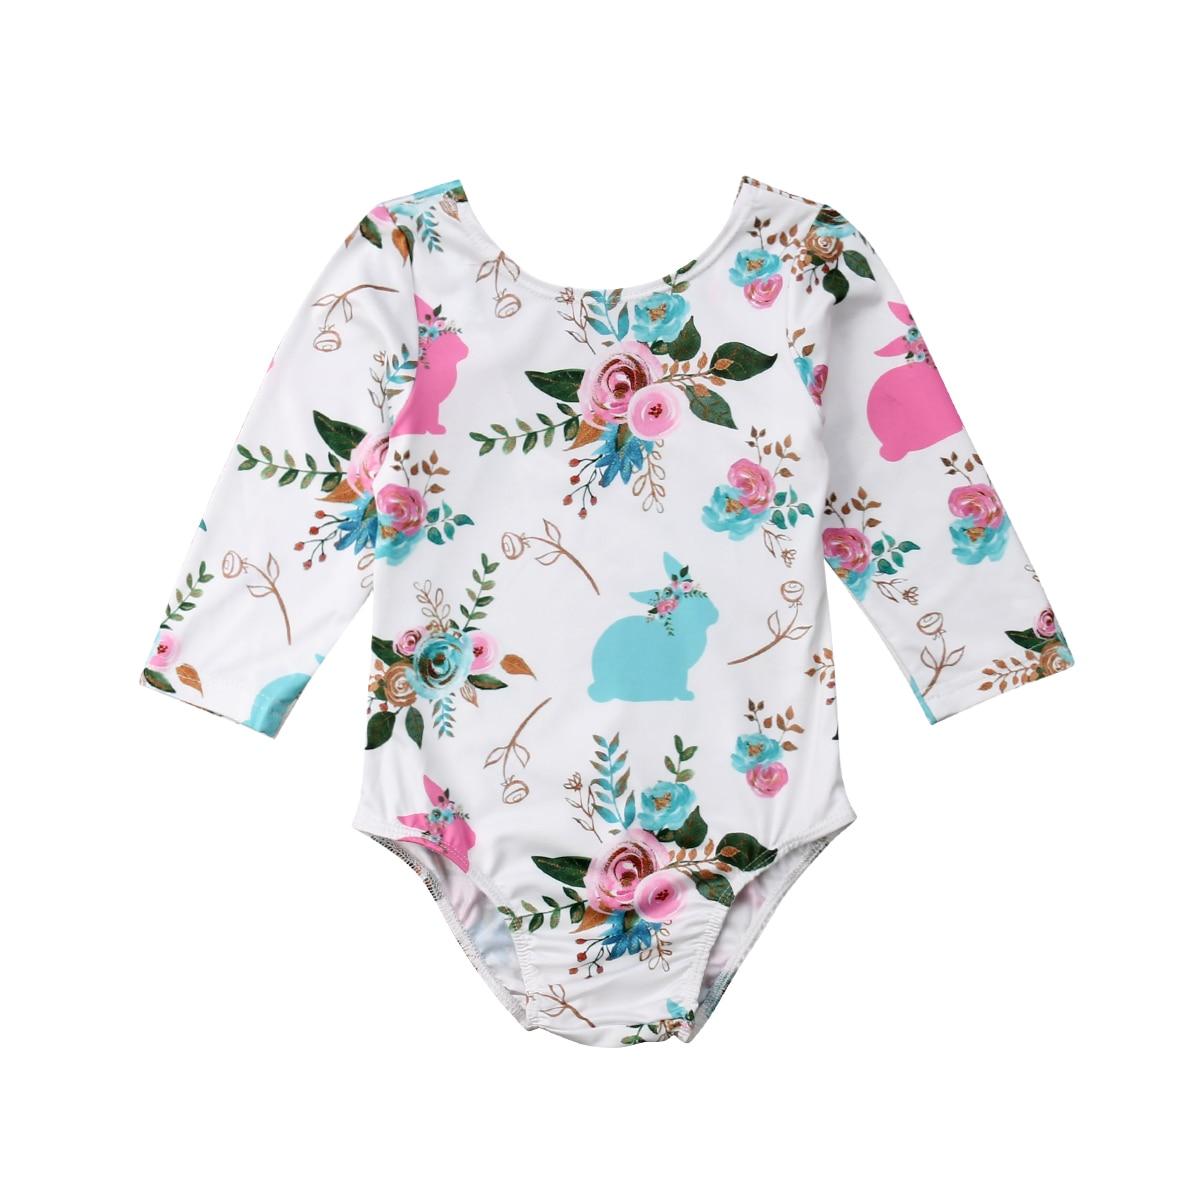 Easter Infant Baby Girls Floral Rabbit   Romper   Floral Playsuit Jumpsuit Clothes